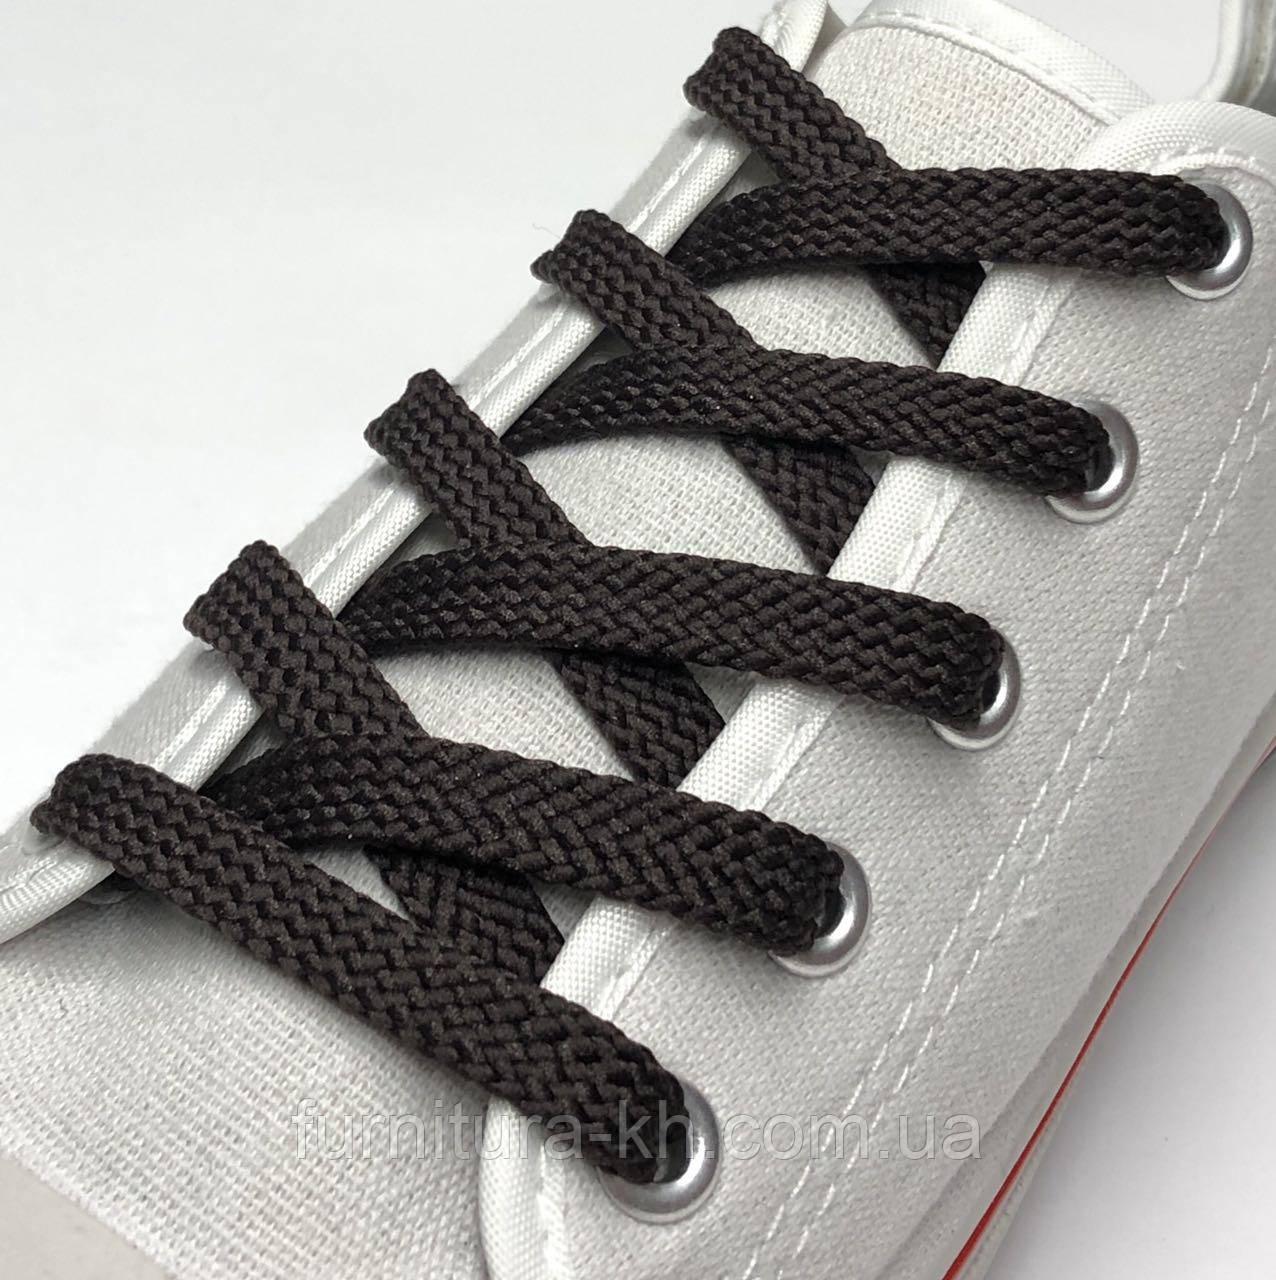 Шнурок Простой Плоский Длинна 1 метр  цвет Темно Коричневый (ширина 7 мм)